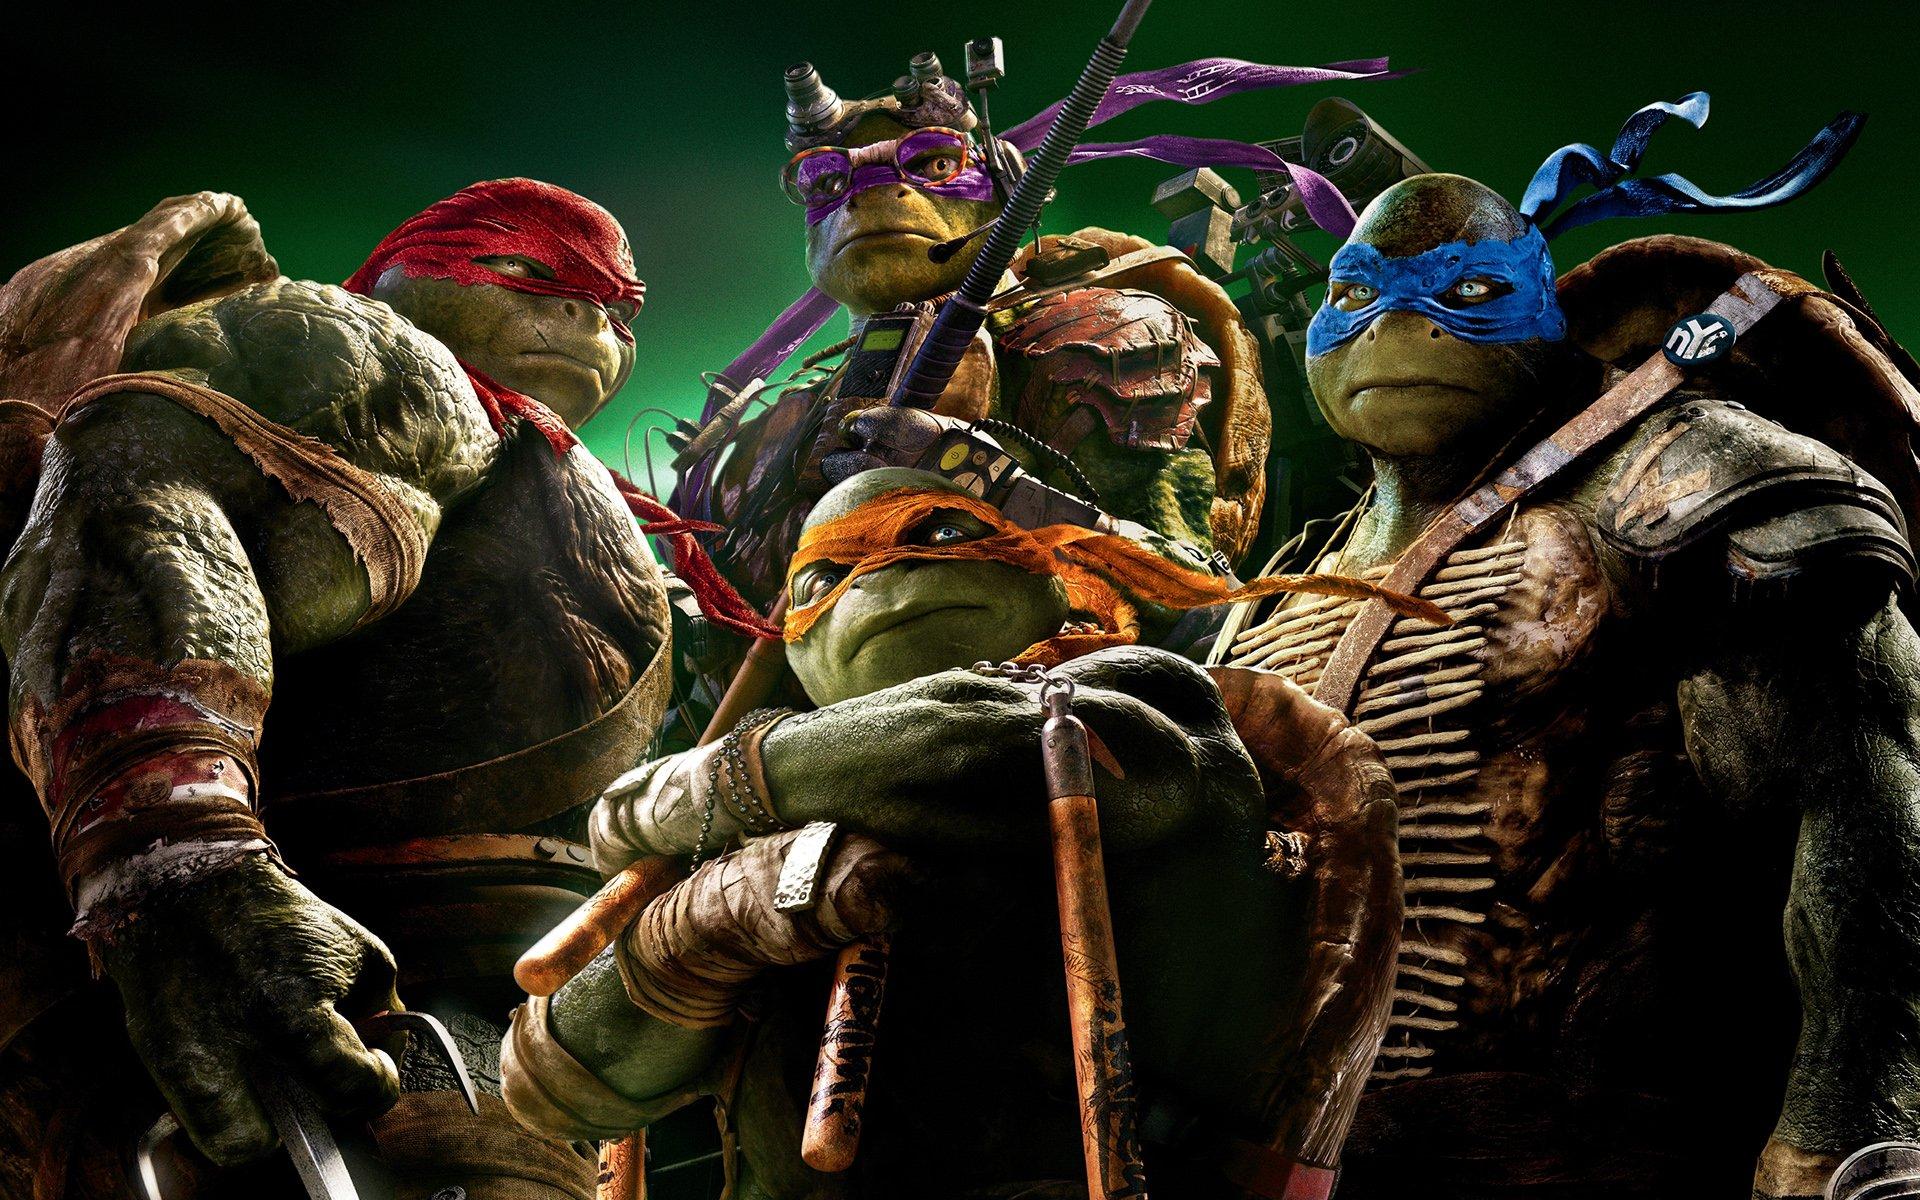 142 Teenage Mutant Ninja Turtles HD Wallpapers